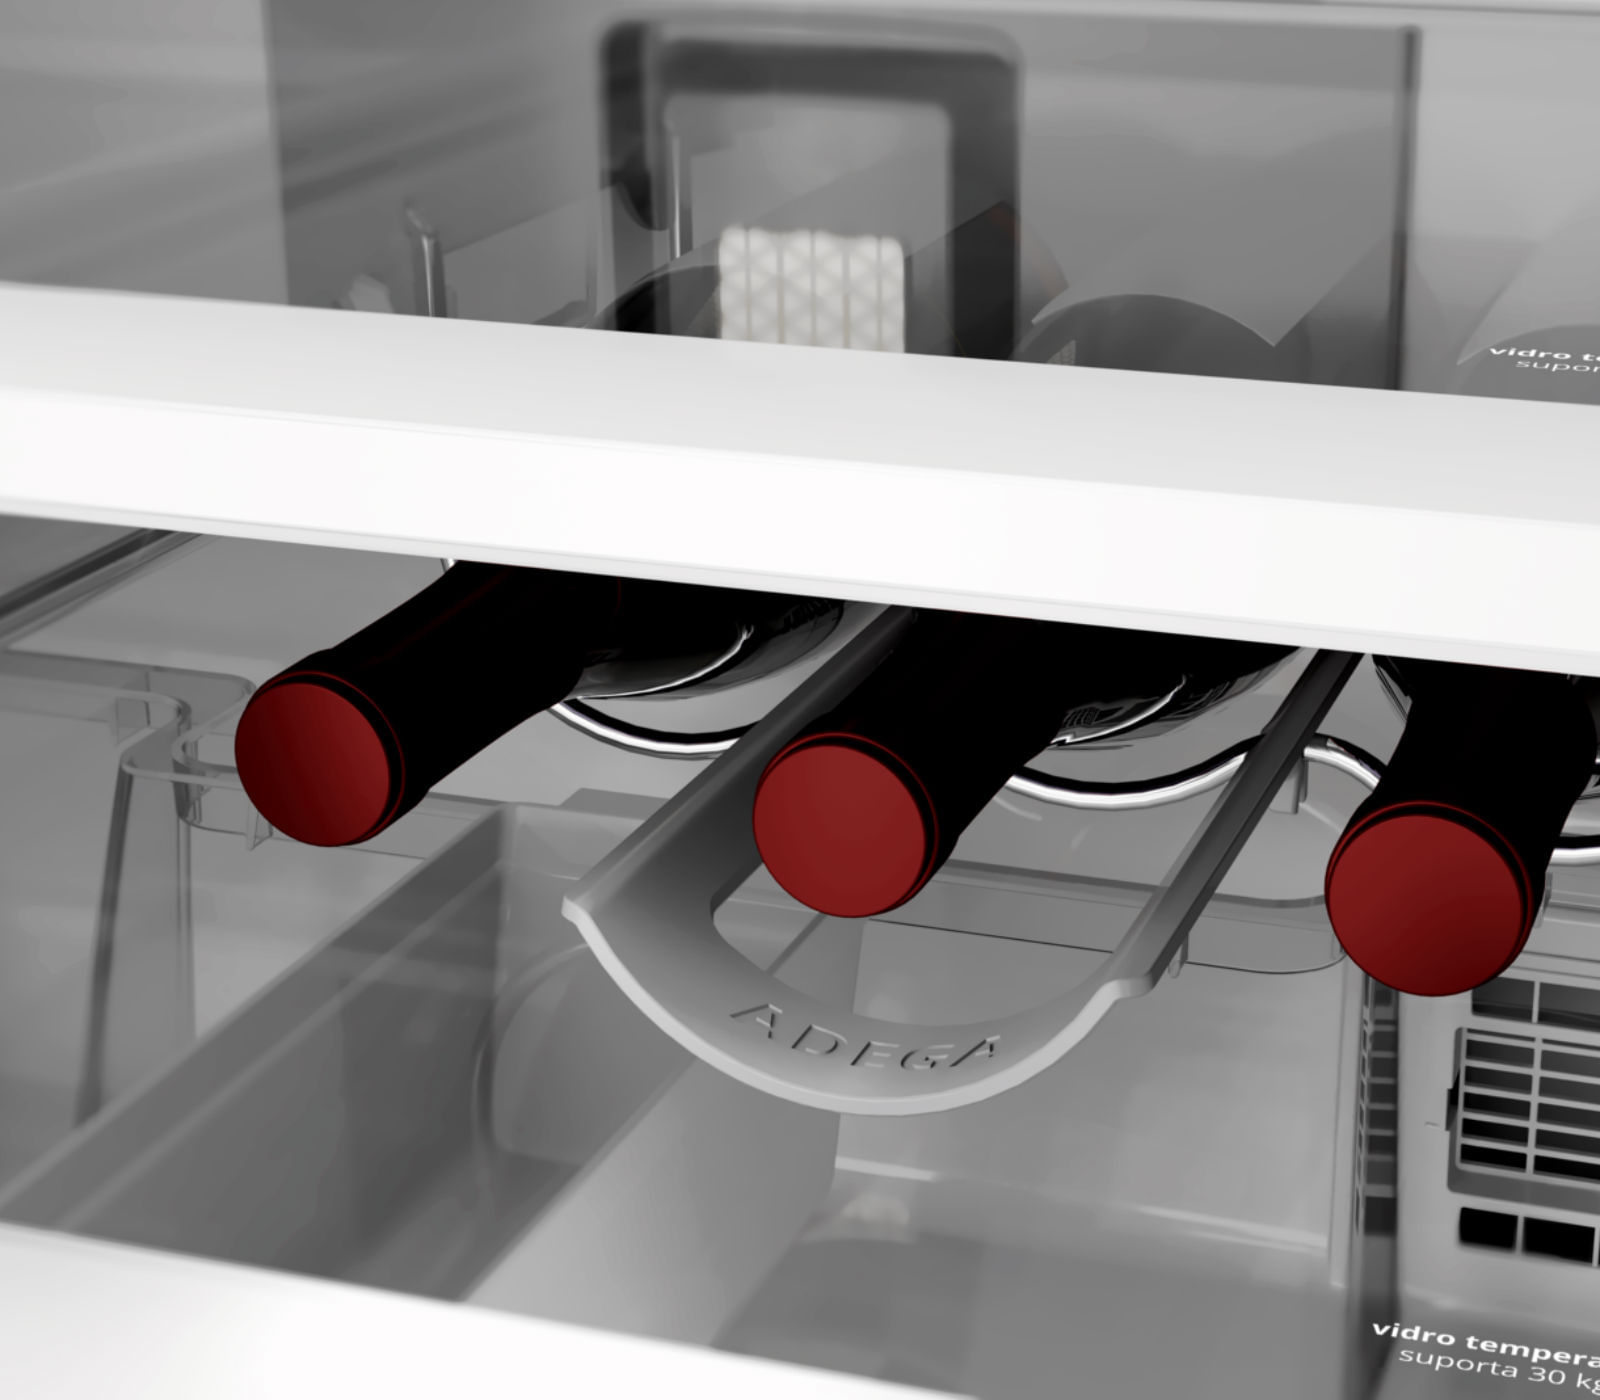 Compartimento Adega Brastemp - W11113070